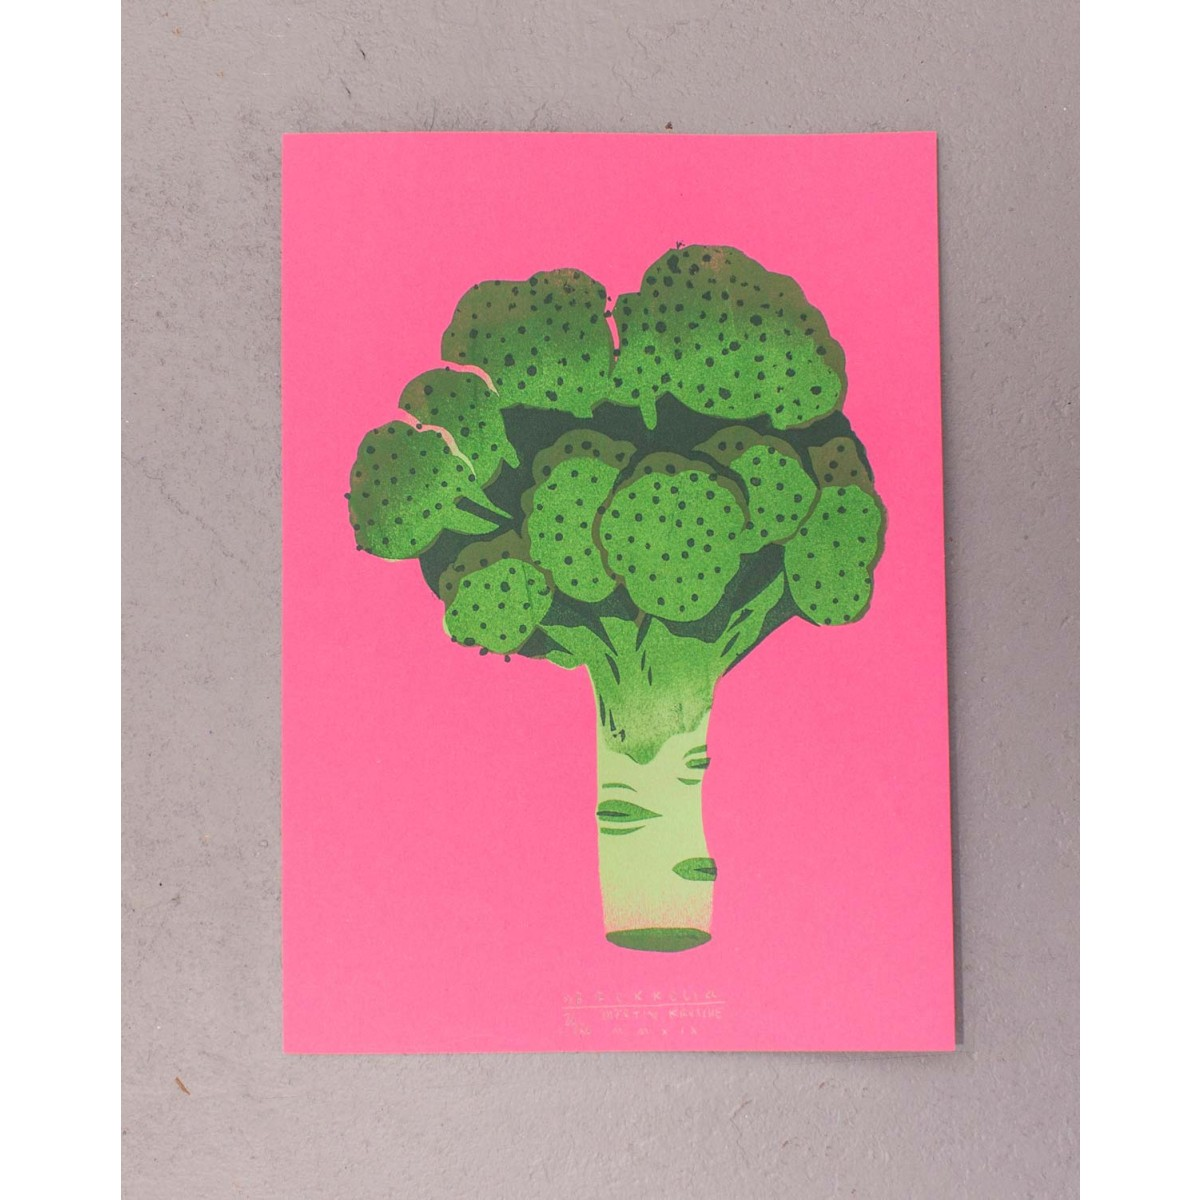 Artprint Stencil »Brokkoli« DINA4